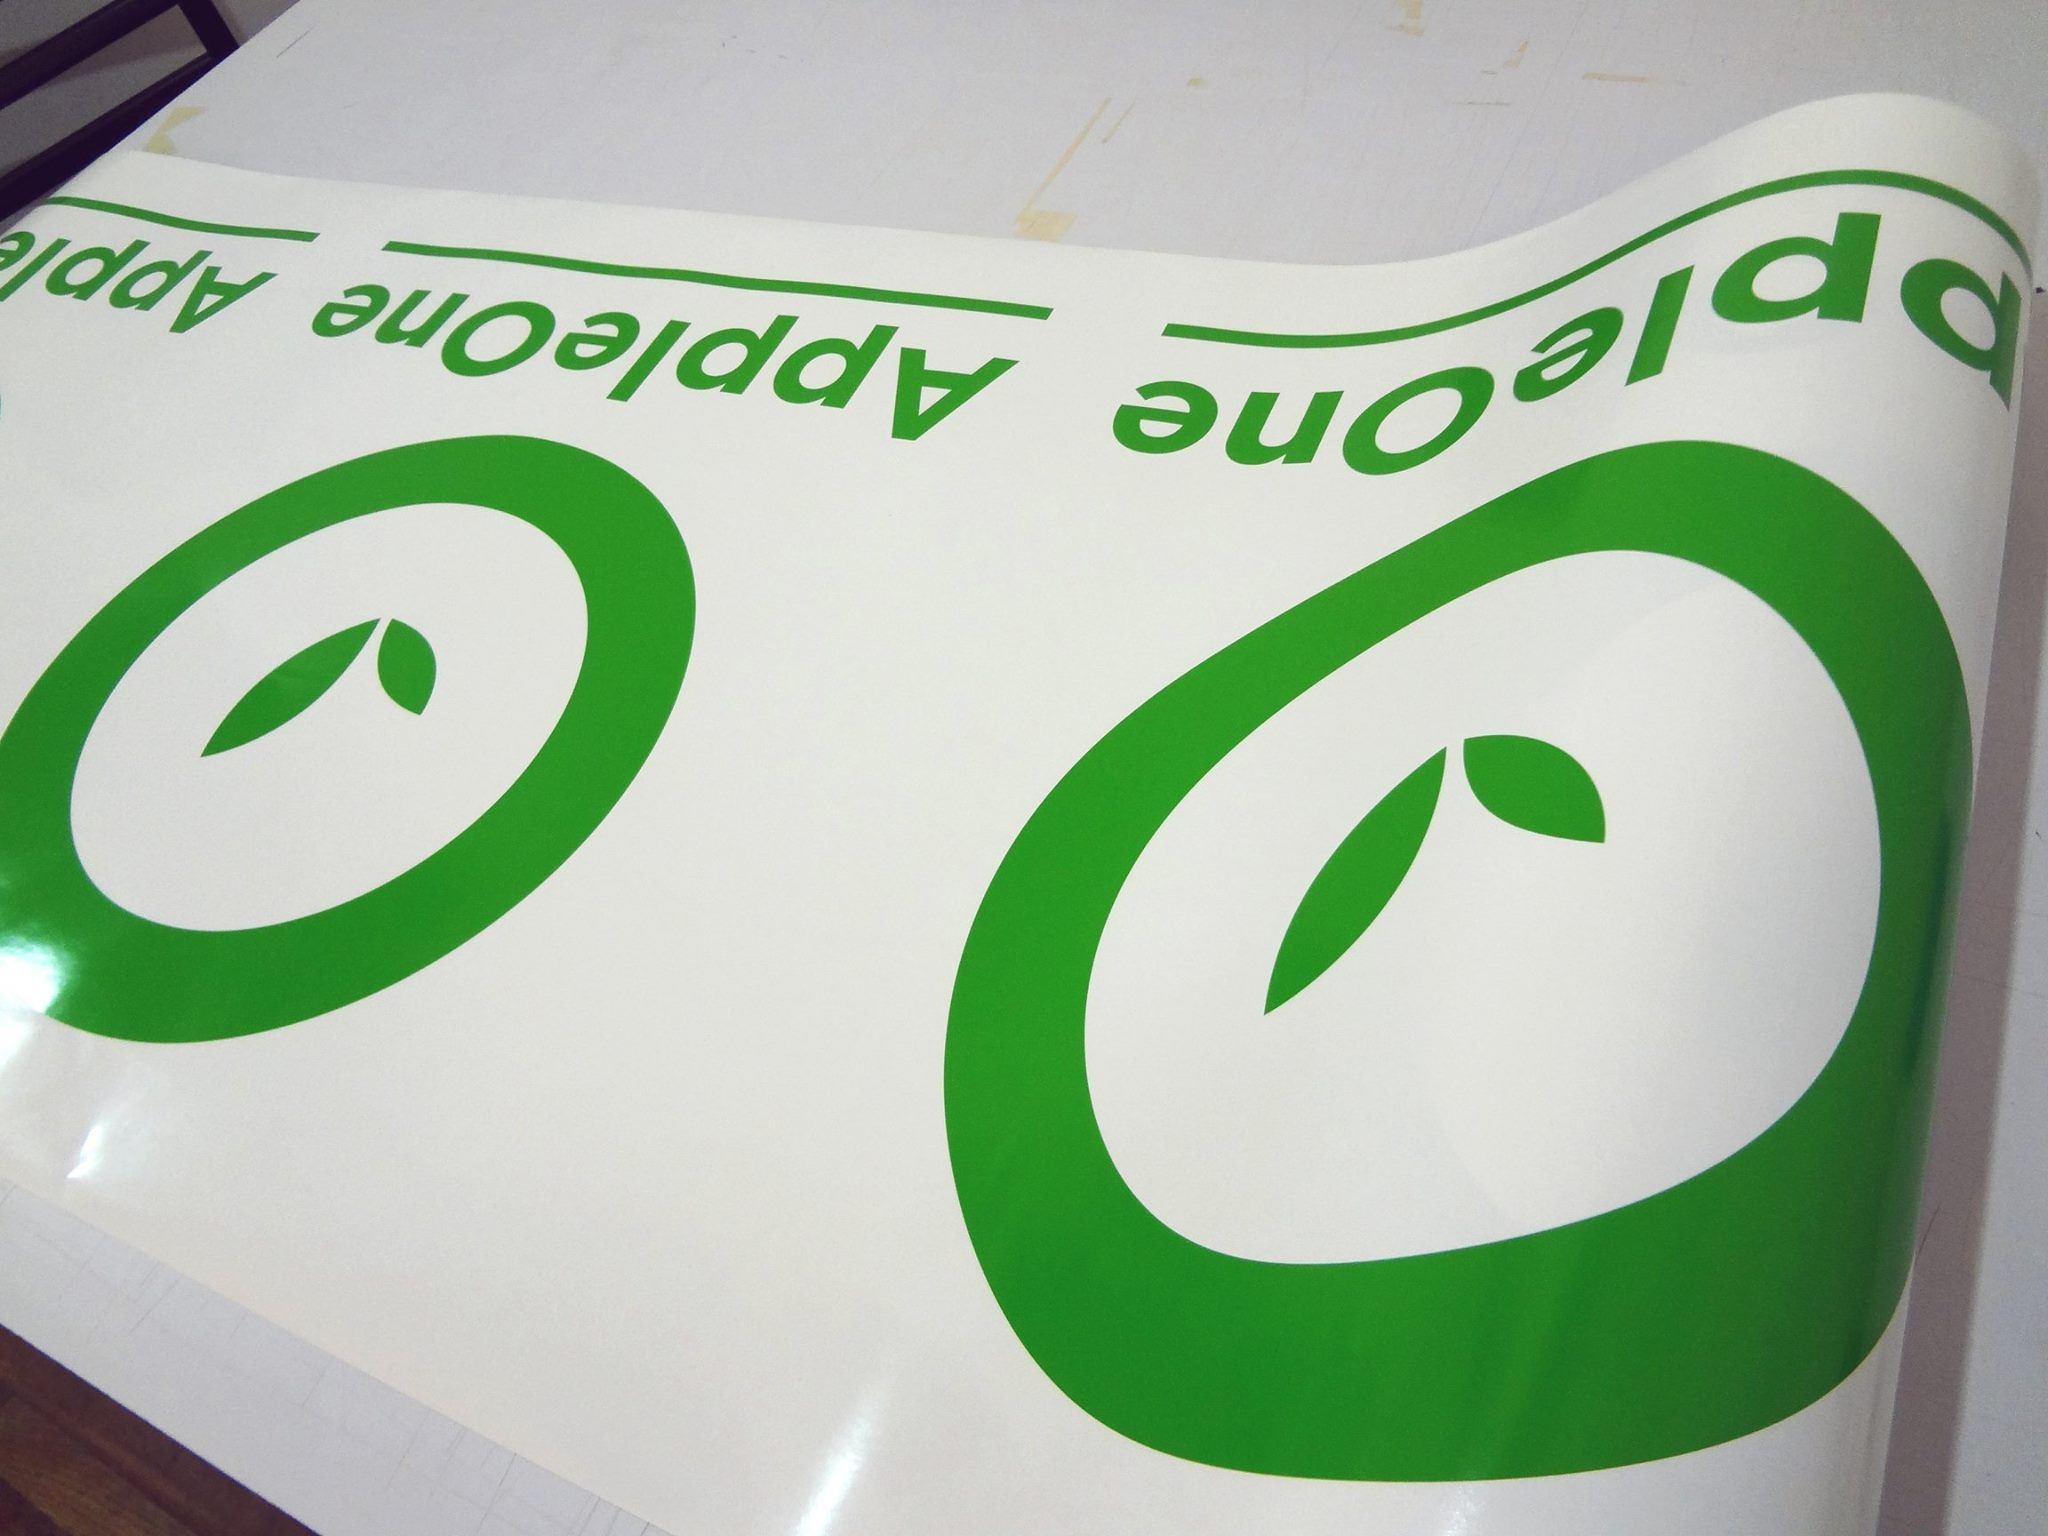 Custom Diecut Adhesive Vinyl Logos In Yellow Green For More - Custom vinyl adhesive signs